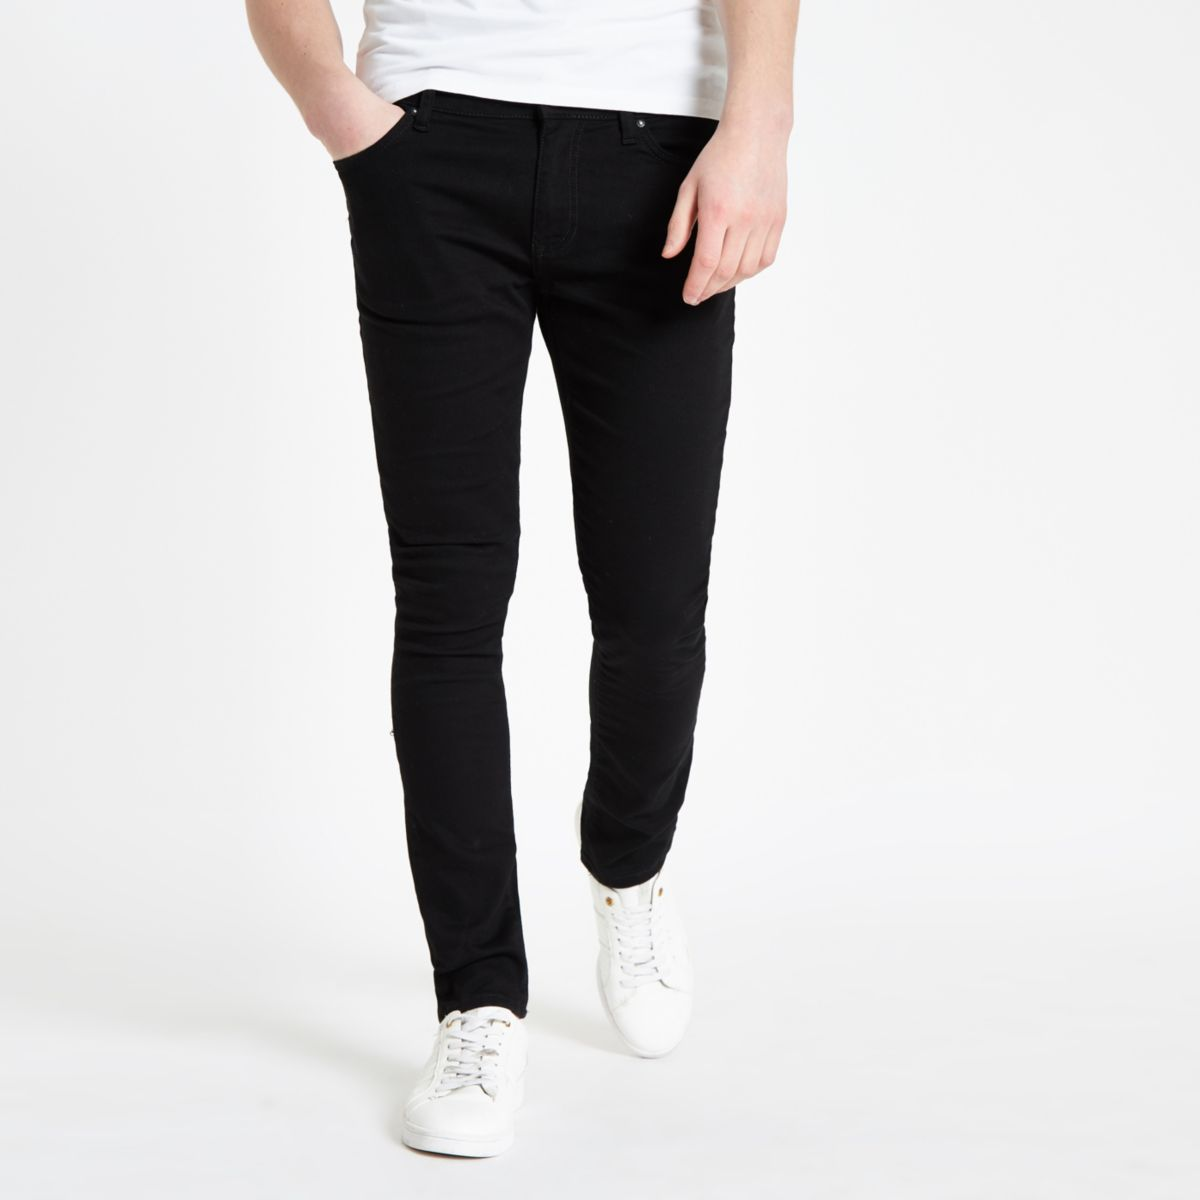 Black super skinny Danny jeans - Super Skinny - Jeans